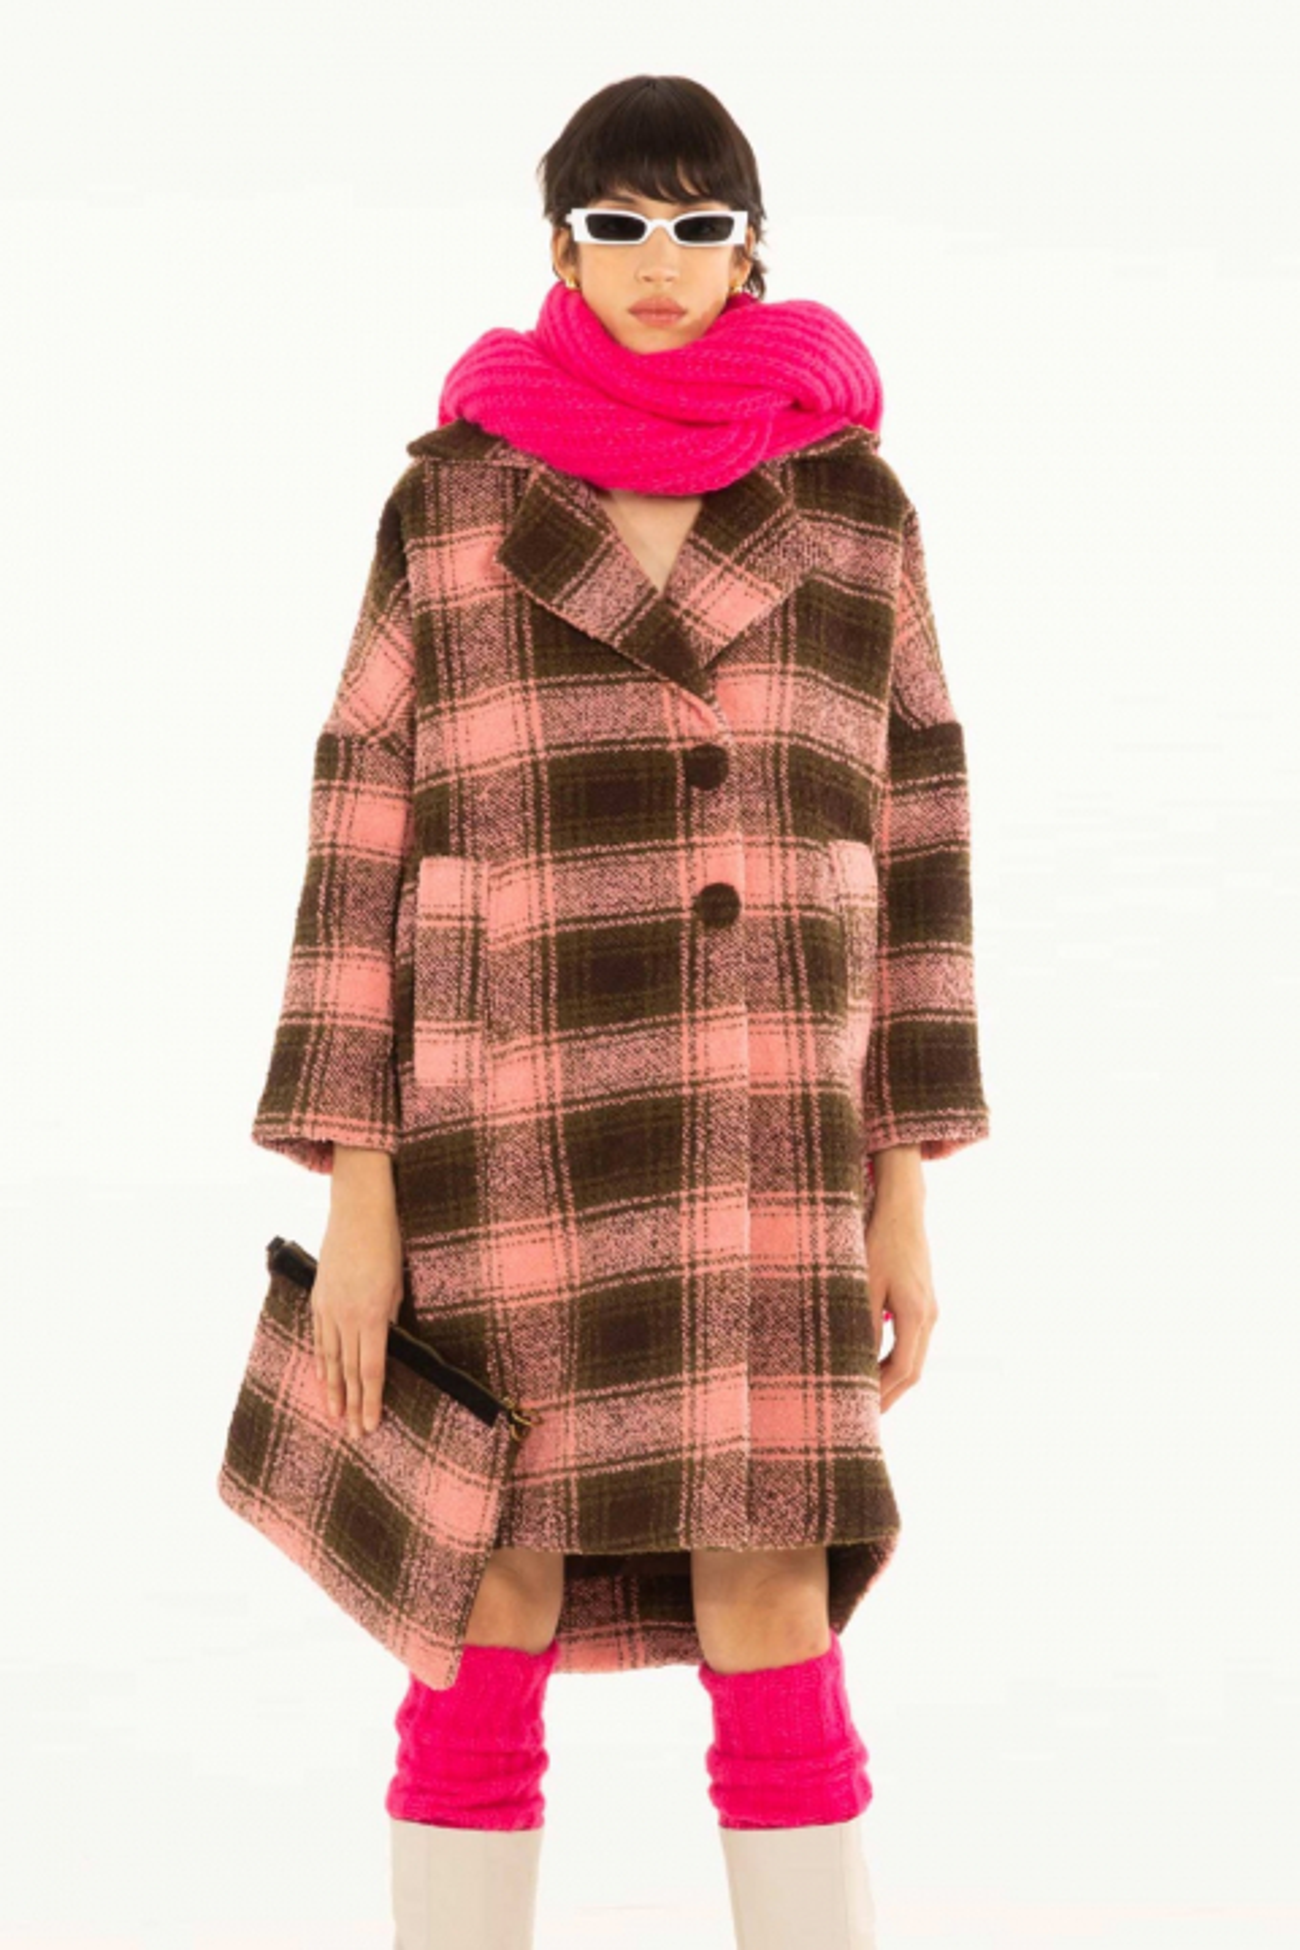 Long coat 9002 inpink/green wool blend